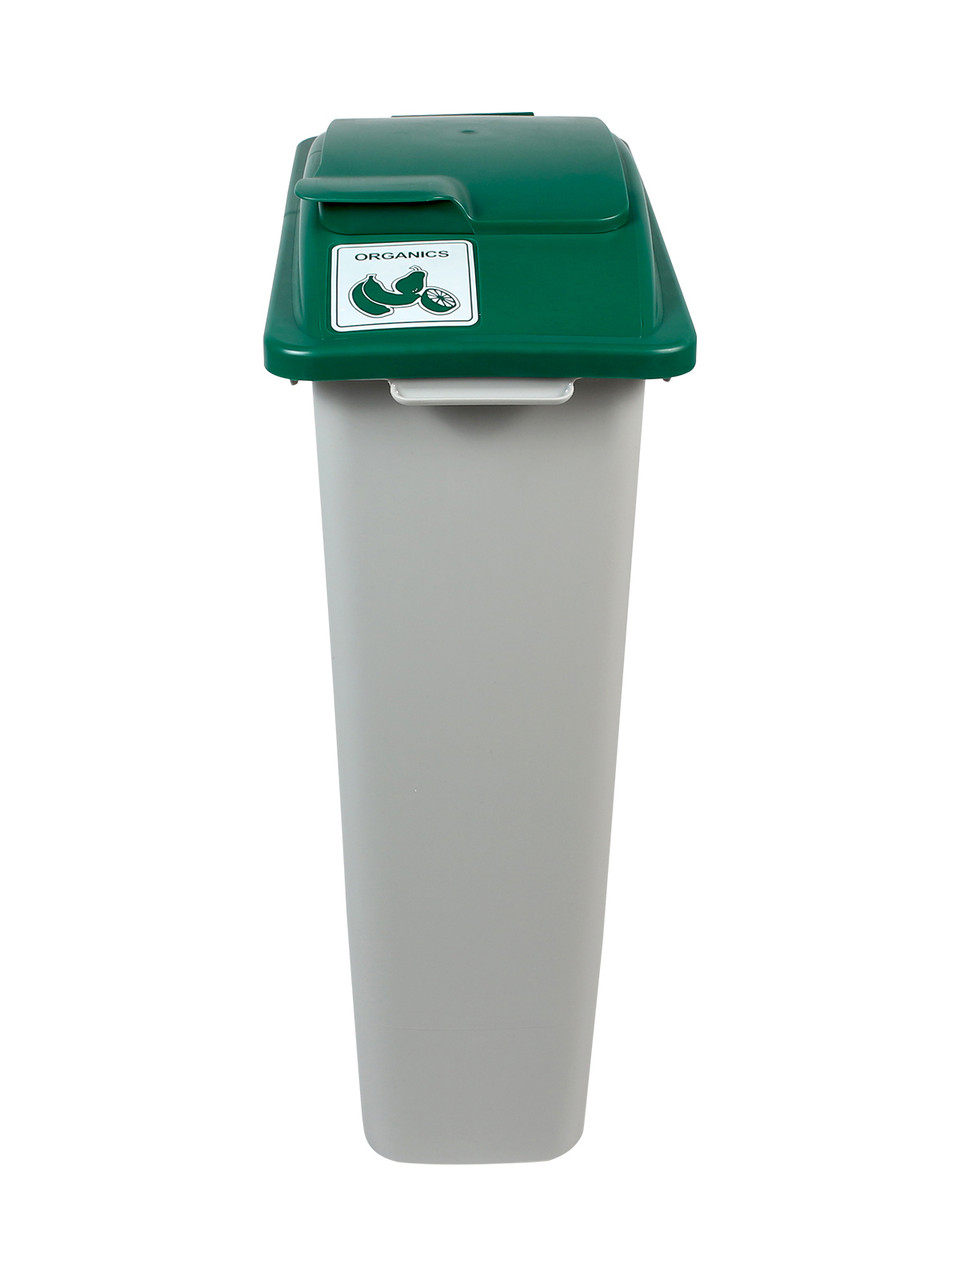 23 Gallon Skinny Compost Bin Lift Top